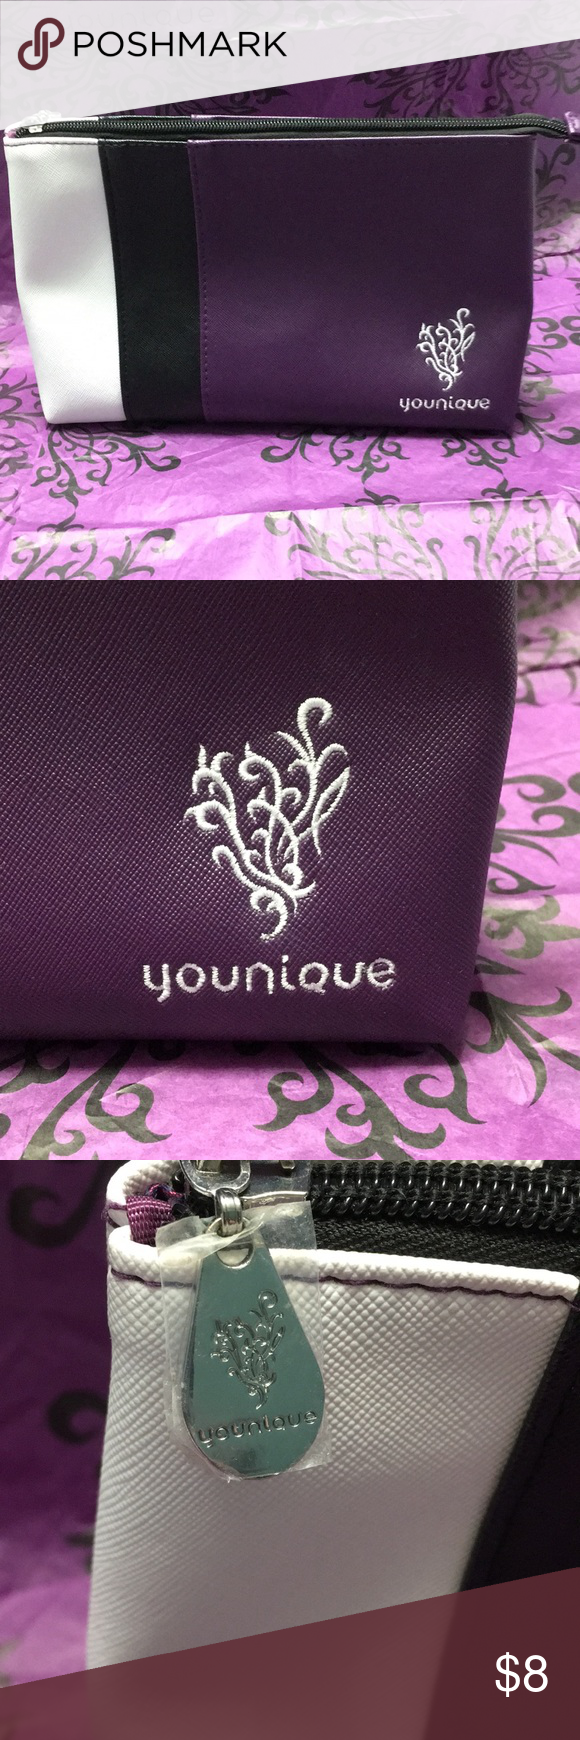 Younique makeup bag Makeup bag, Younique makeup, Makeup